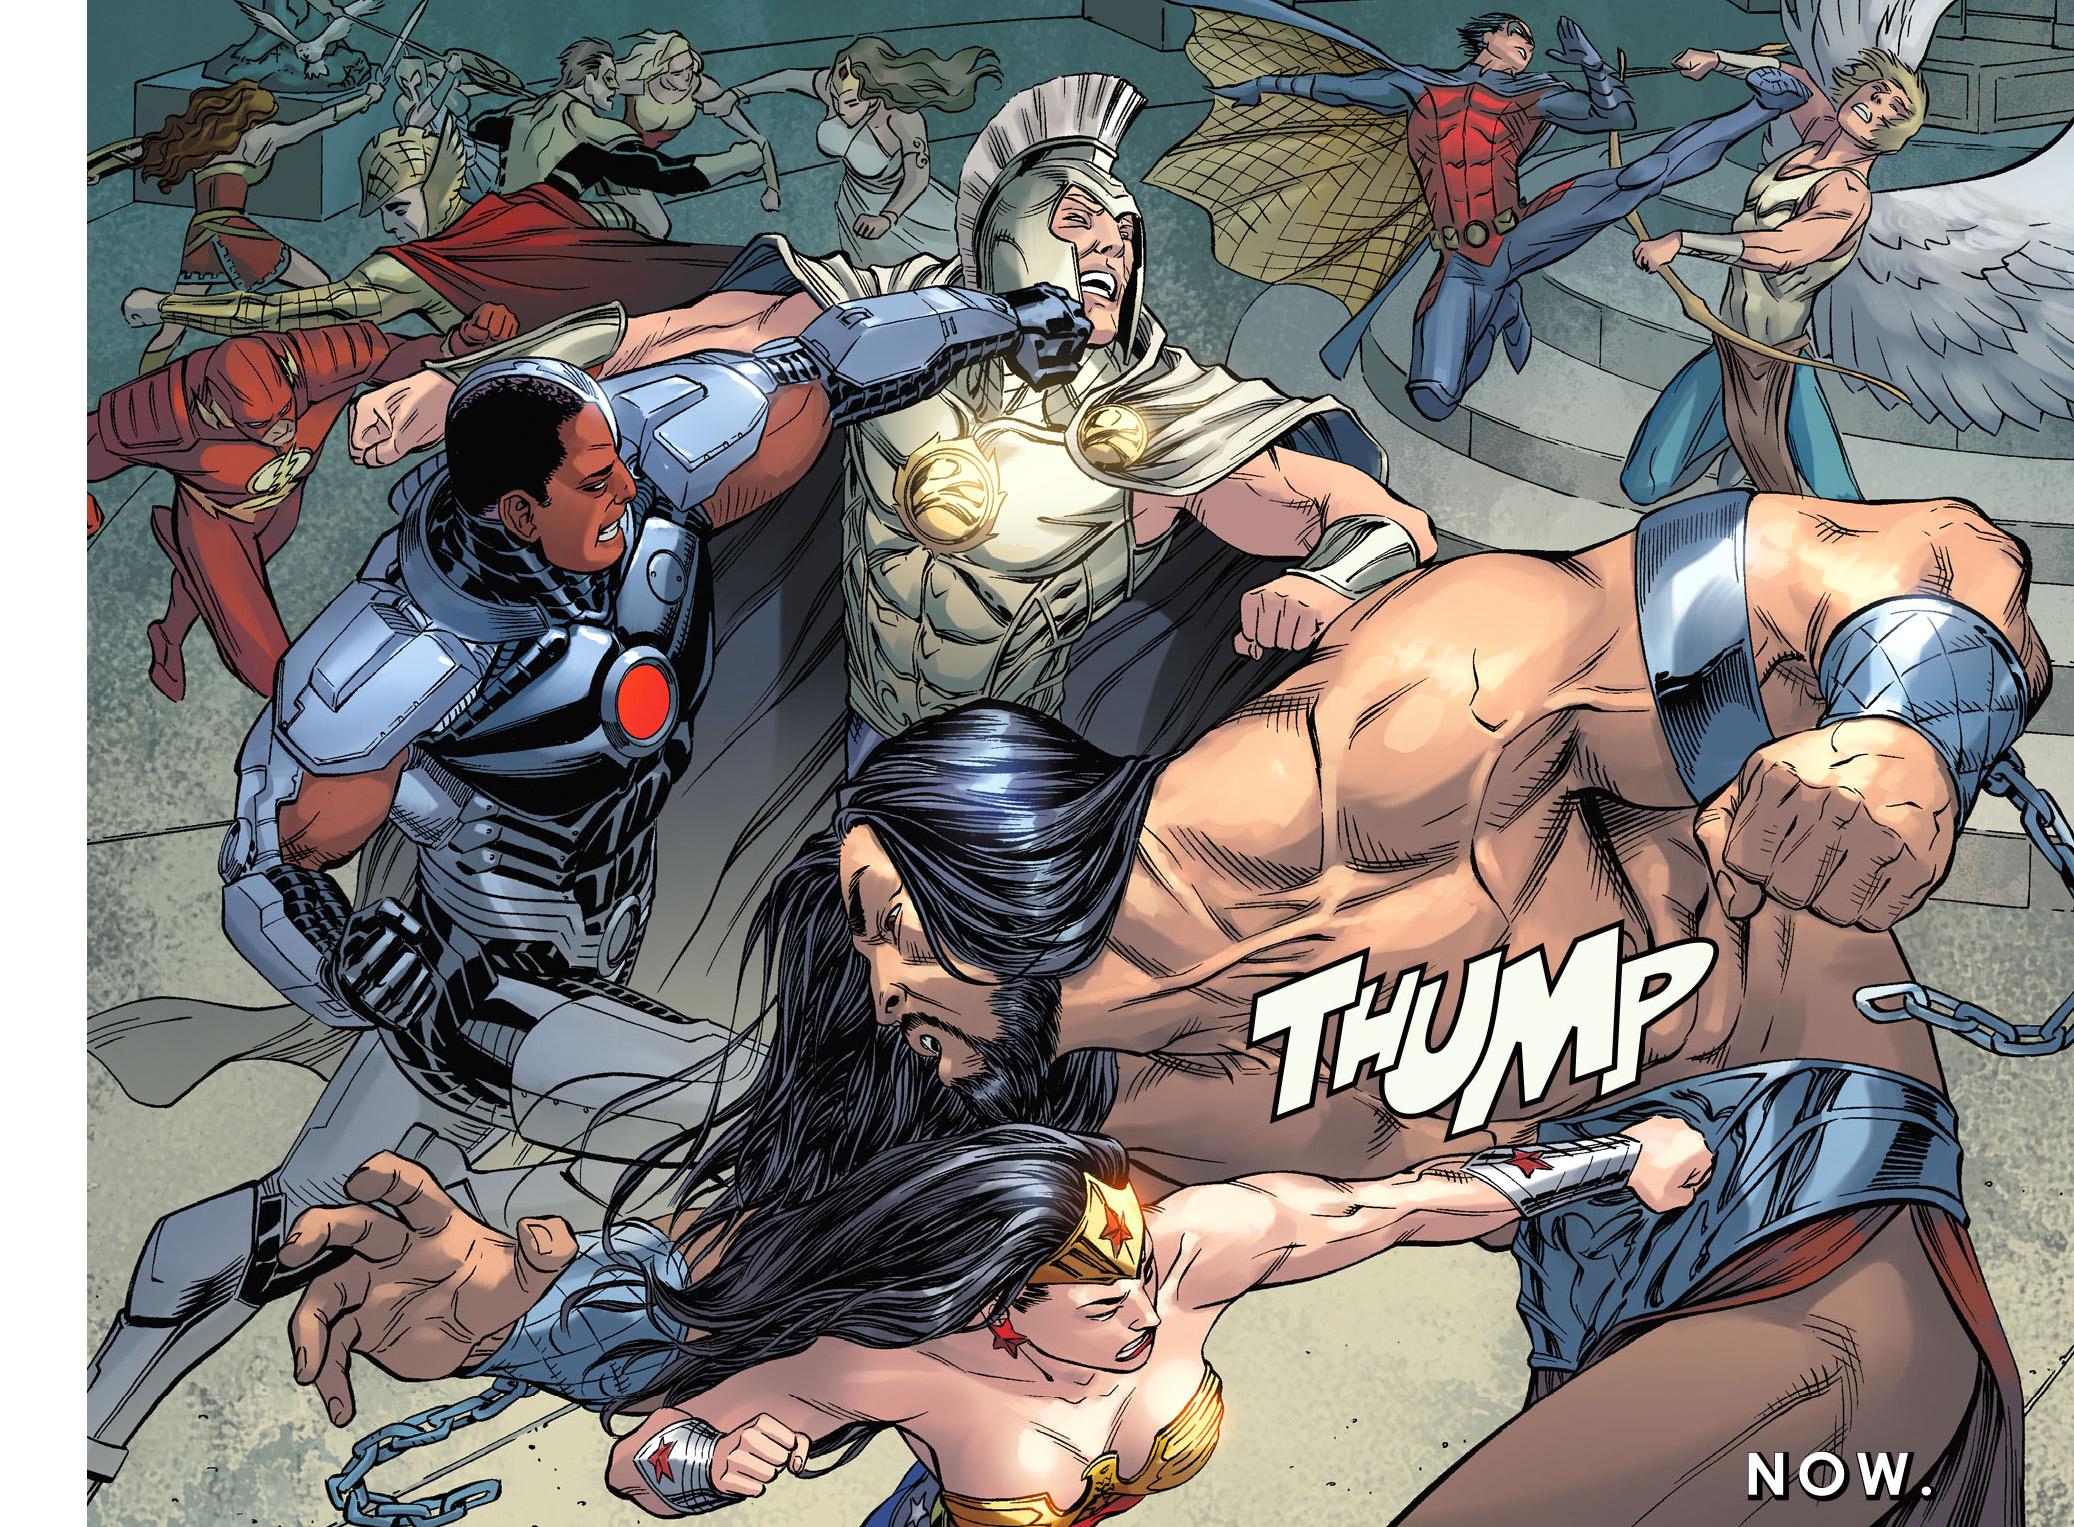 justice league vs greek gods (injustice gods among us)